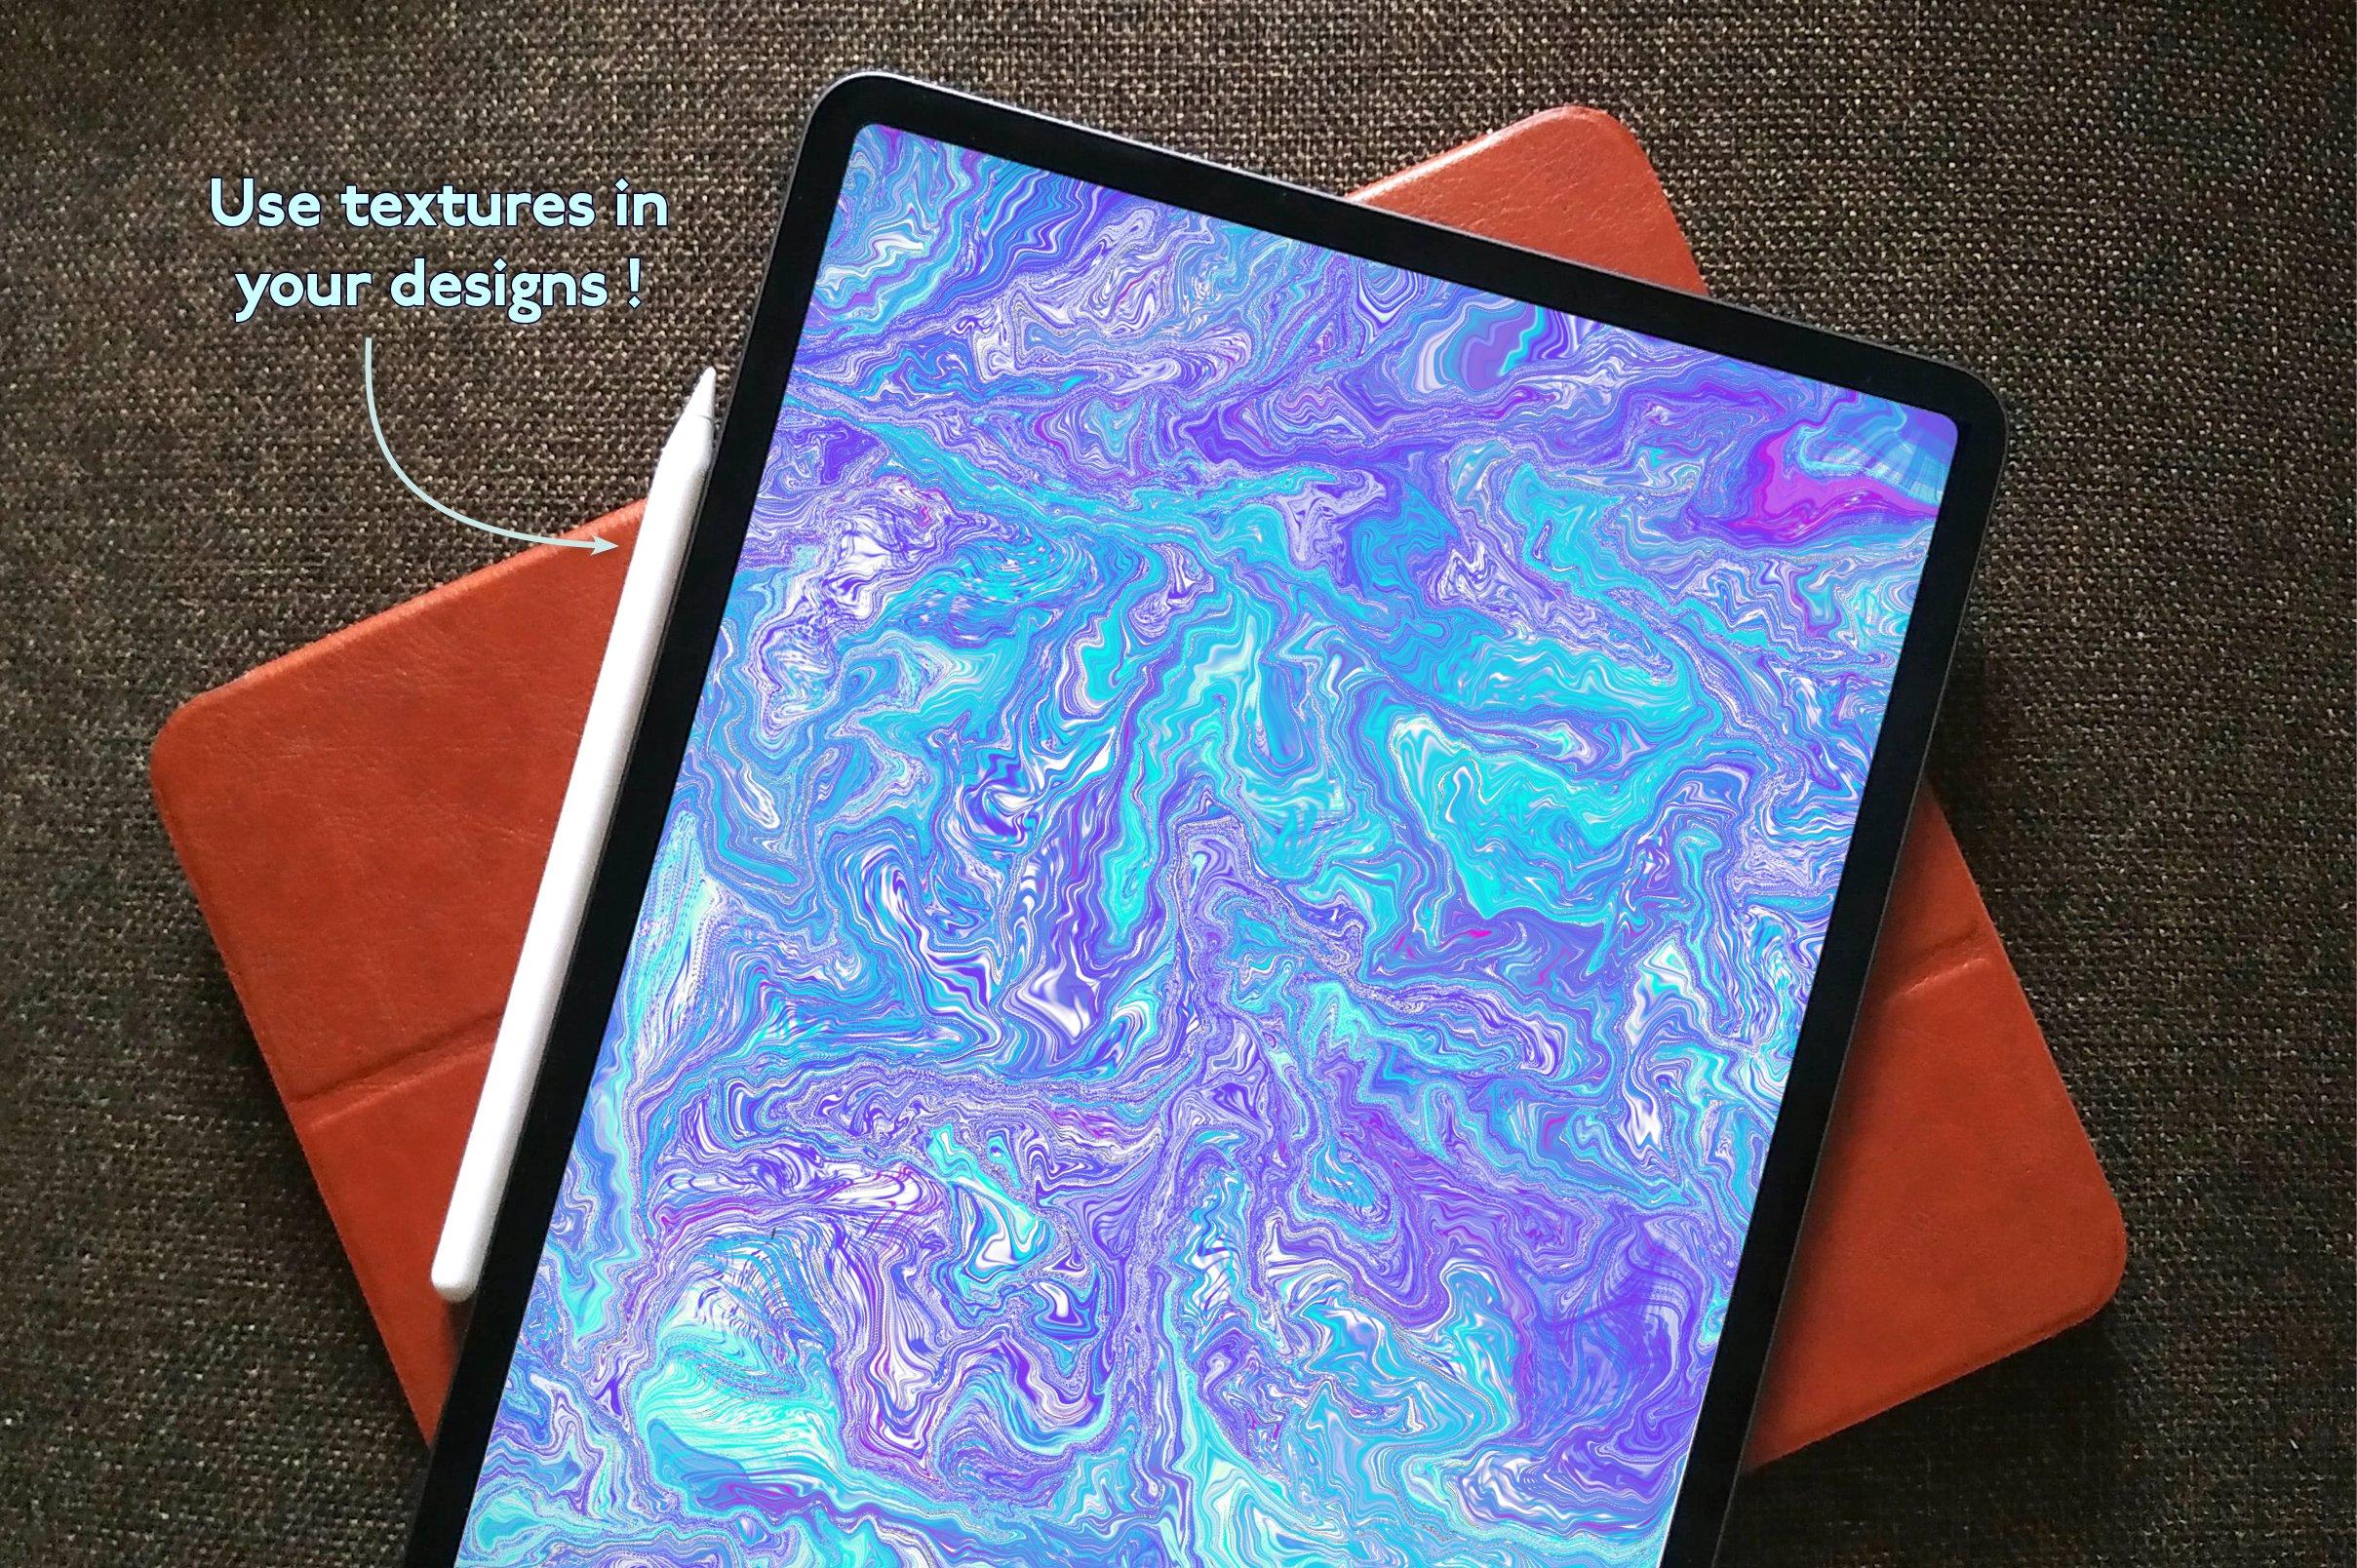 大理石纹理Procreate笔刷 Liquid Marble Texture Brush Bundle Noise插图(6)